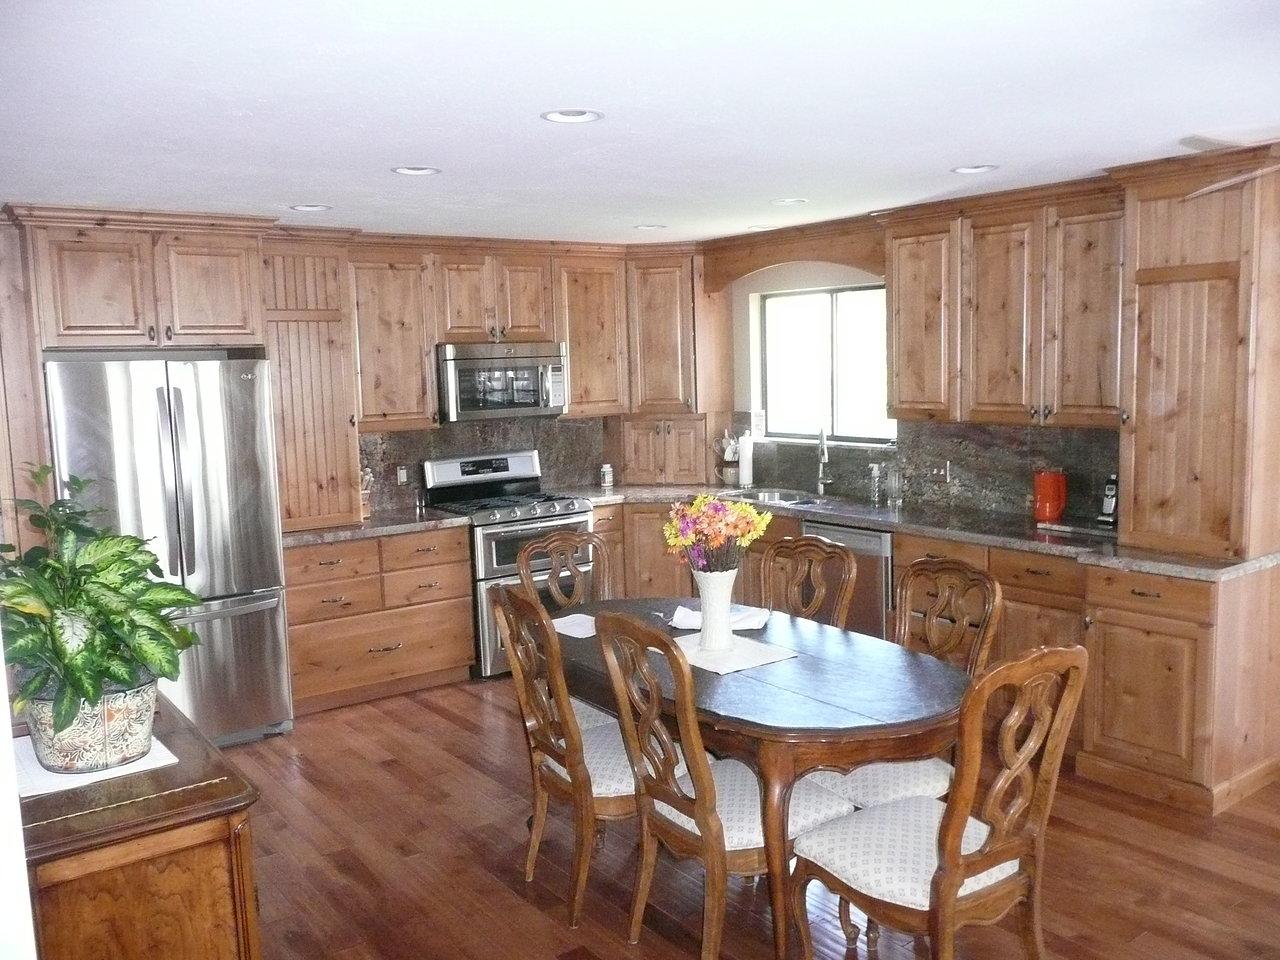 Kitchen+Main+Level+Remodel2.JPG